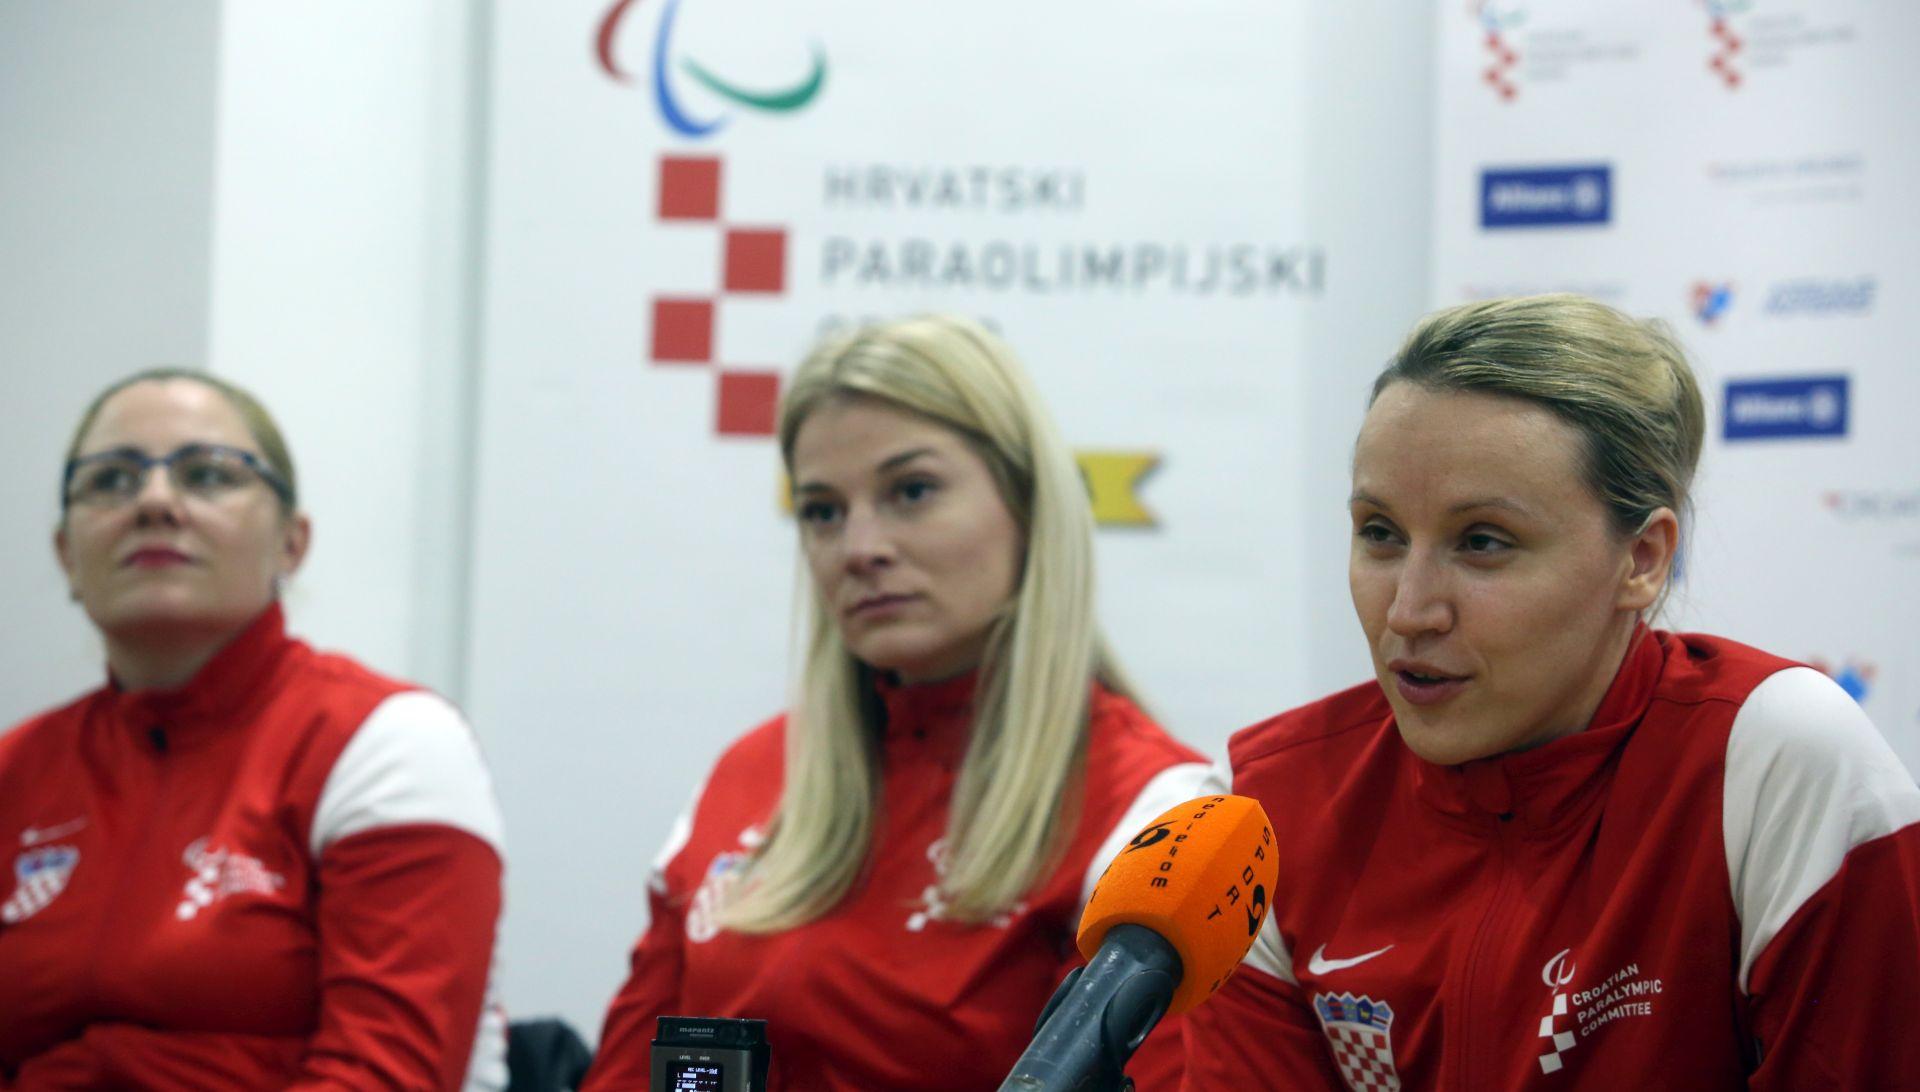 SP – stolni tenis: Dva srebra i bronca za Hrvatsku